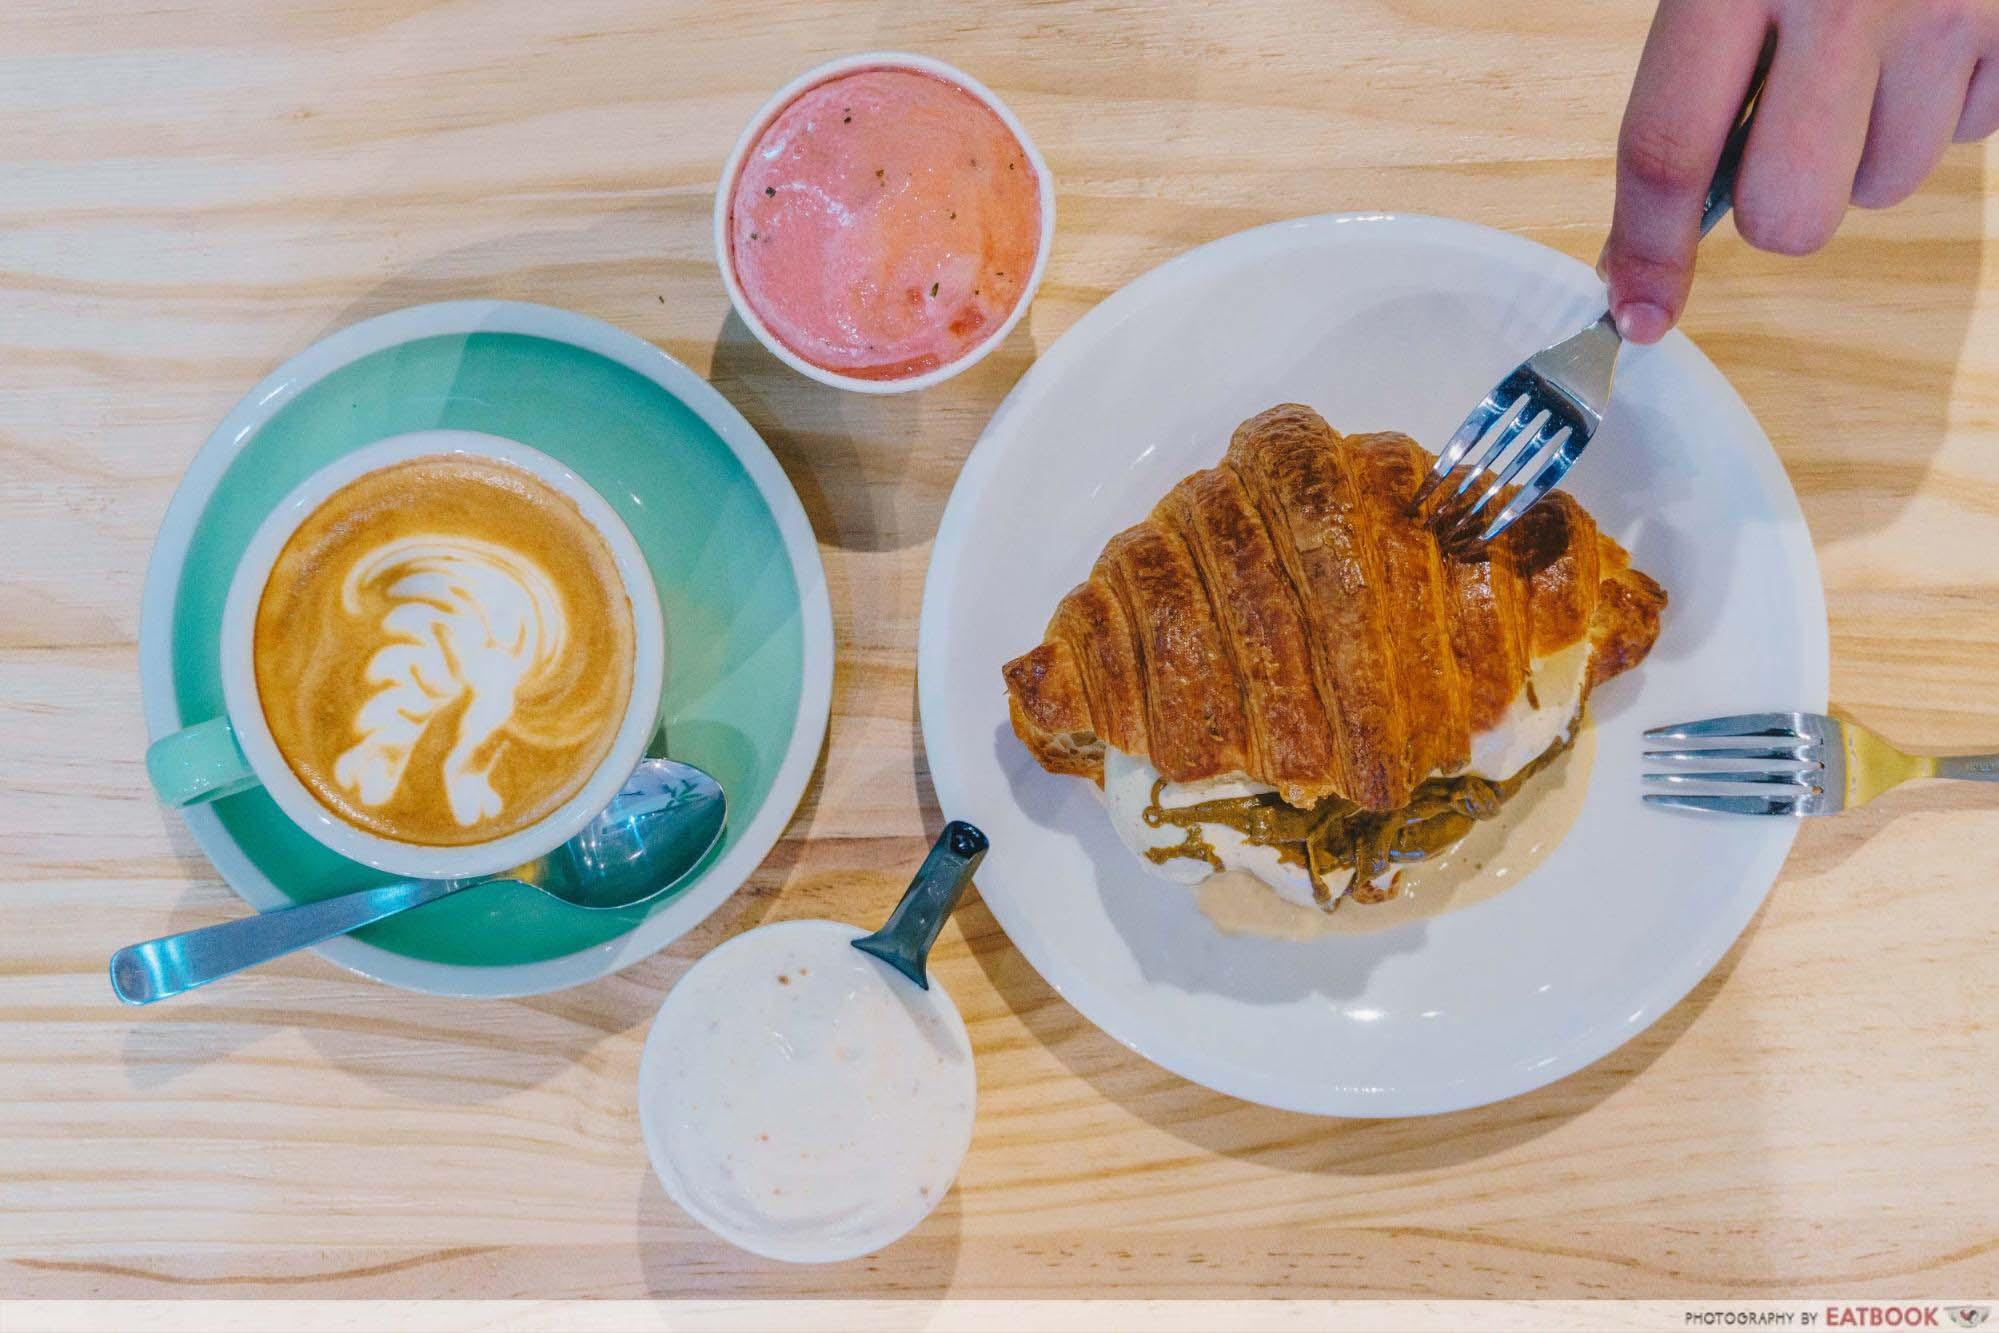 New Restaurants September 2018 - Dopa Dopa Creamery Food